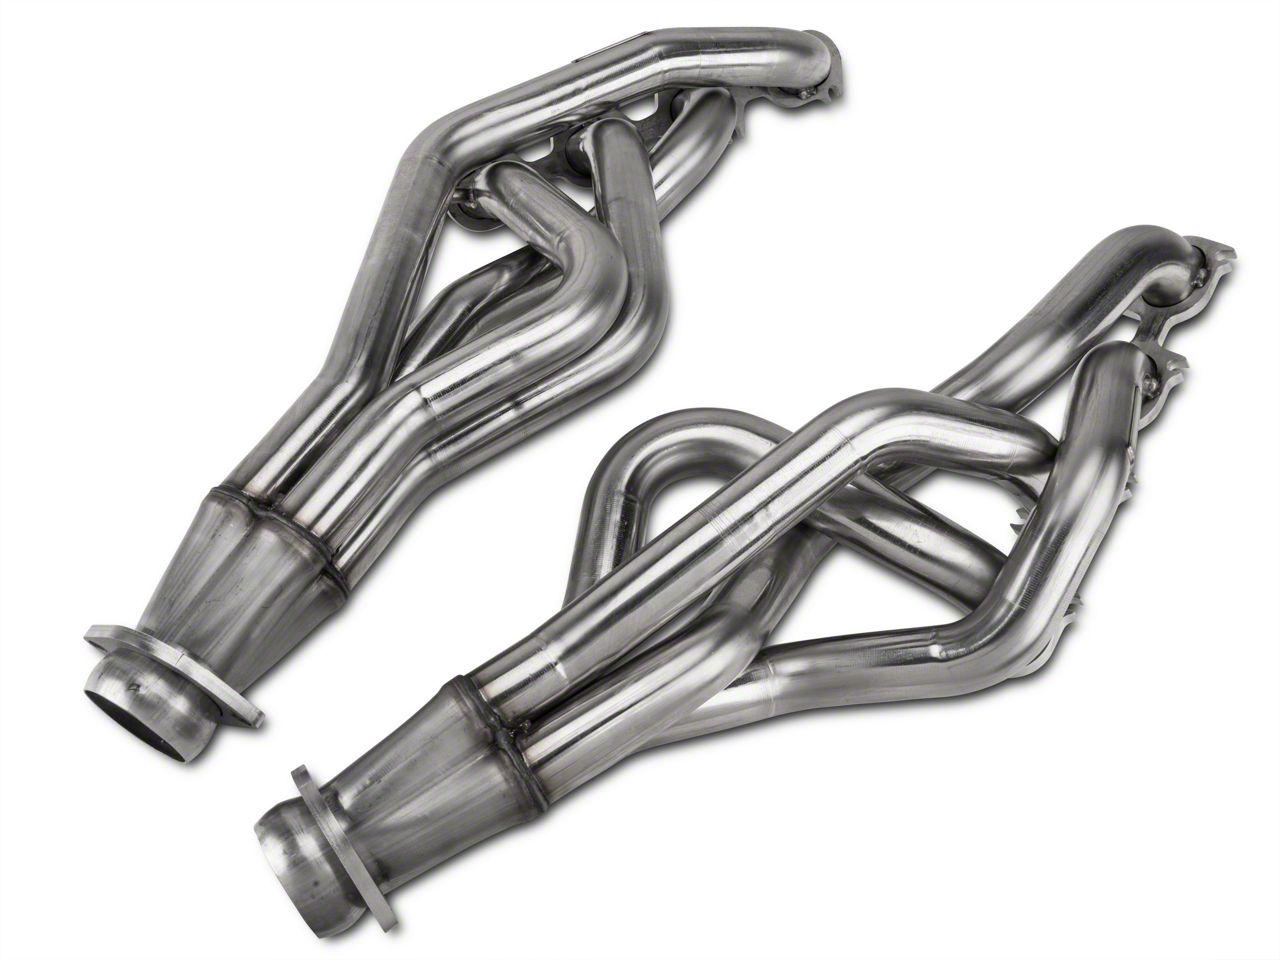 Kooks 1-7/8 in. Long Tube Headers (11-14 GT500)